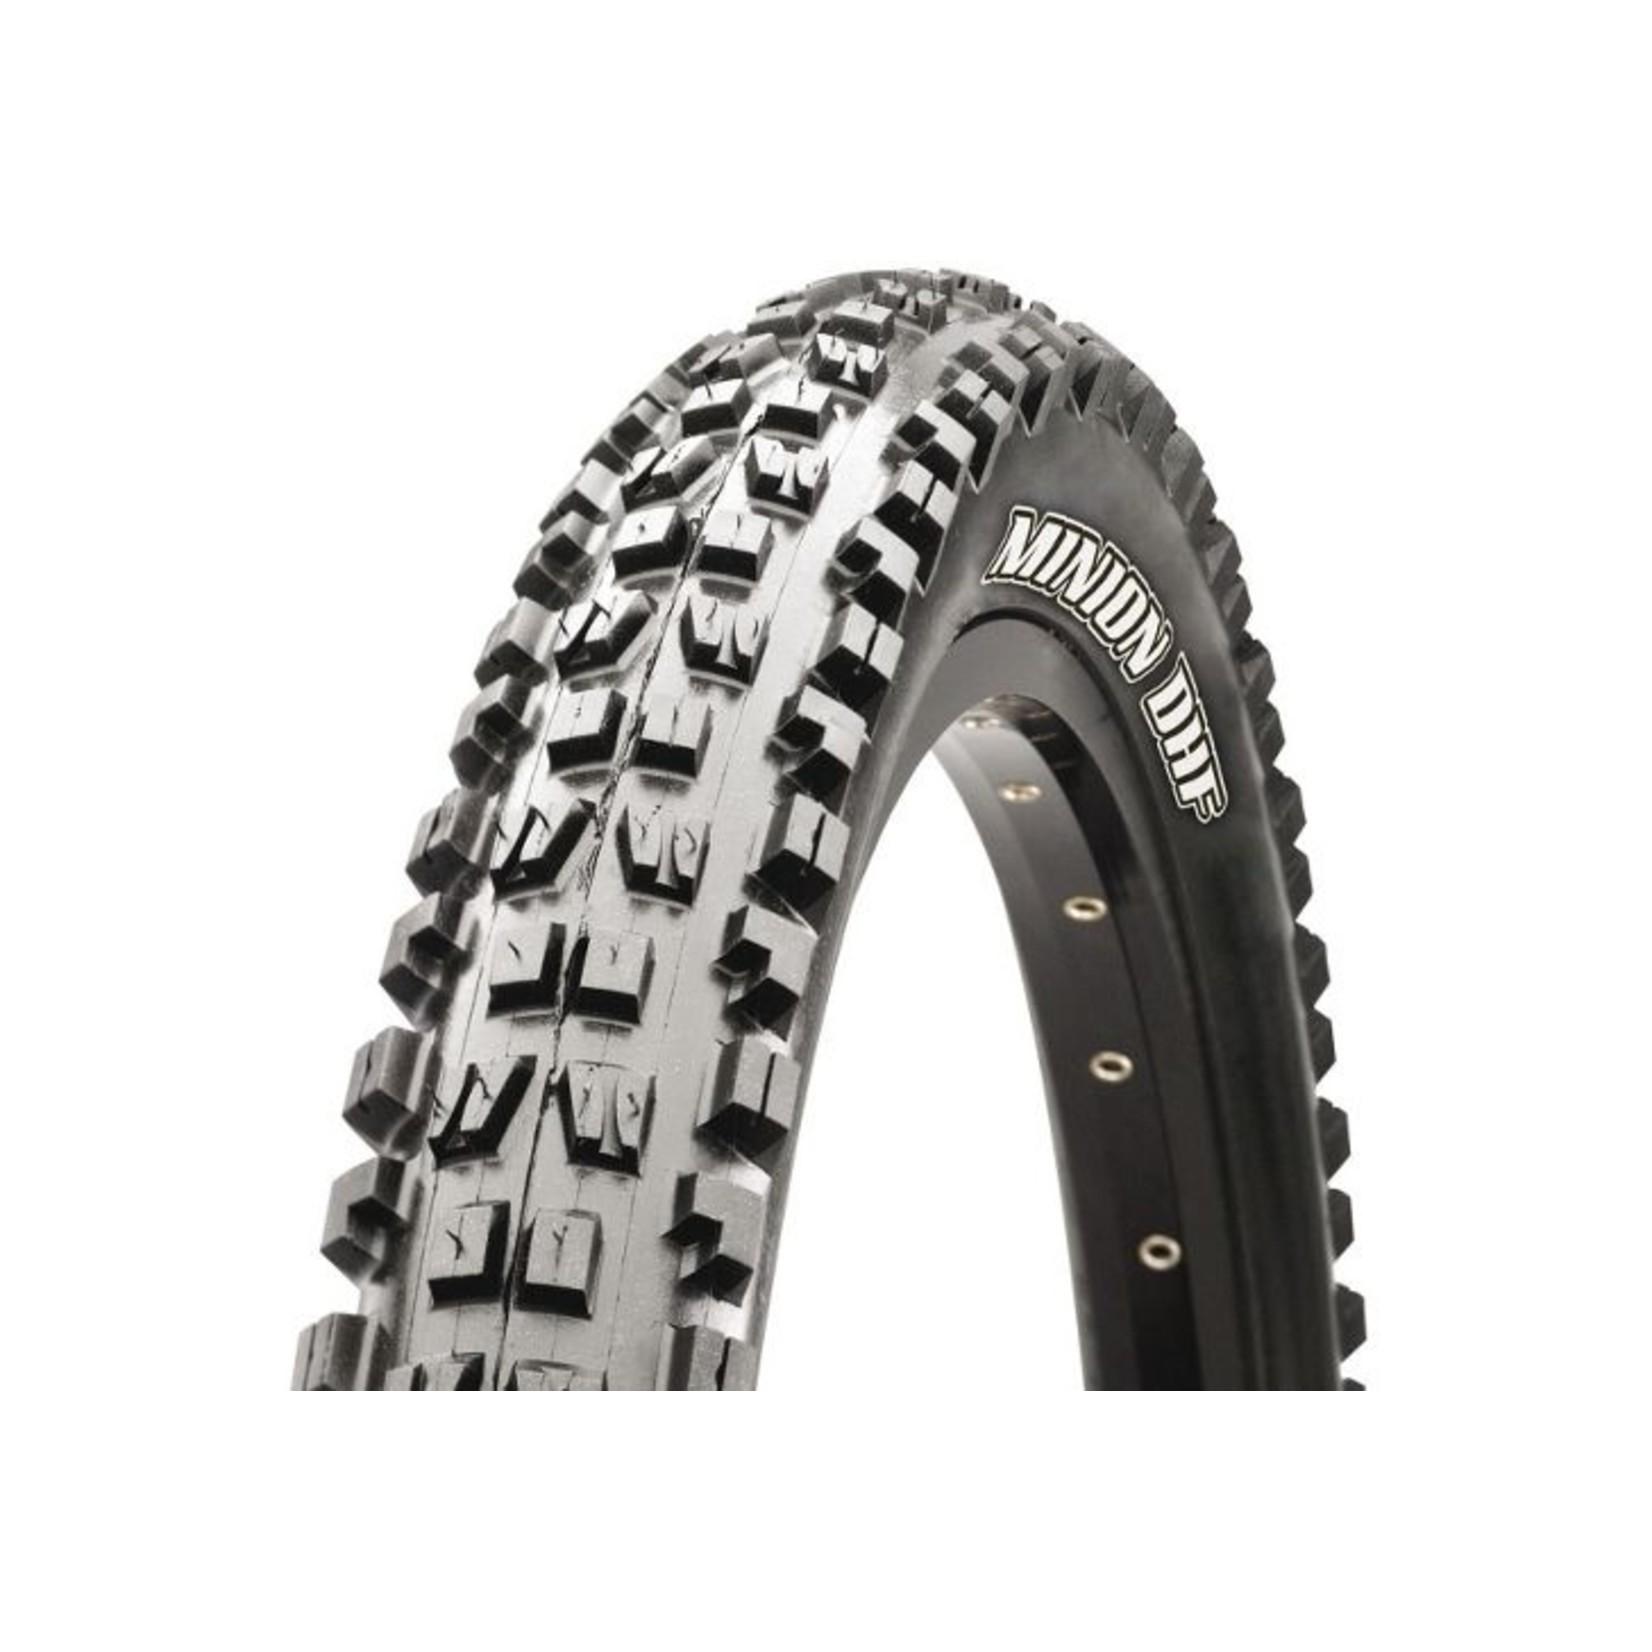 Maxxis Maxxis Minion DHF Tire 27.5 x 2.30 3C EXO Tubeless Ready